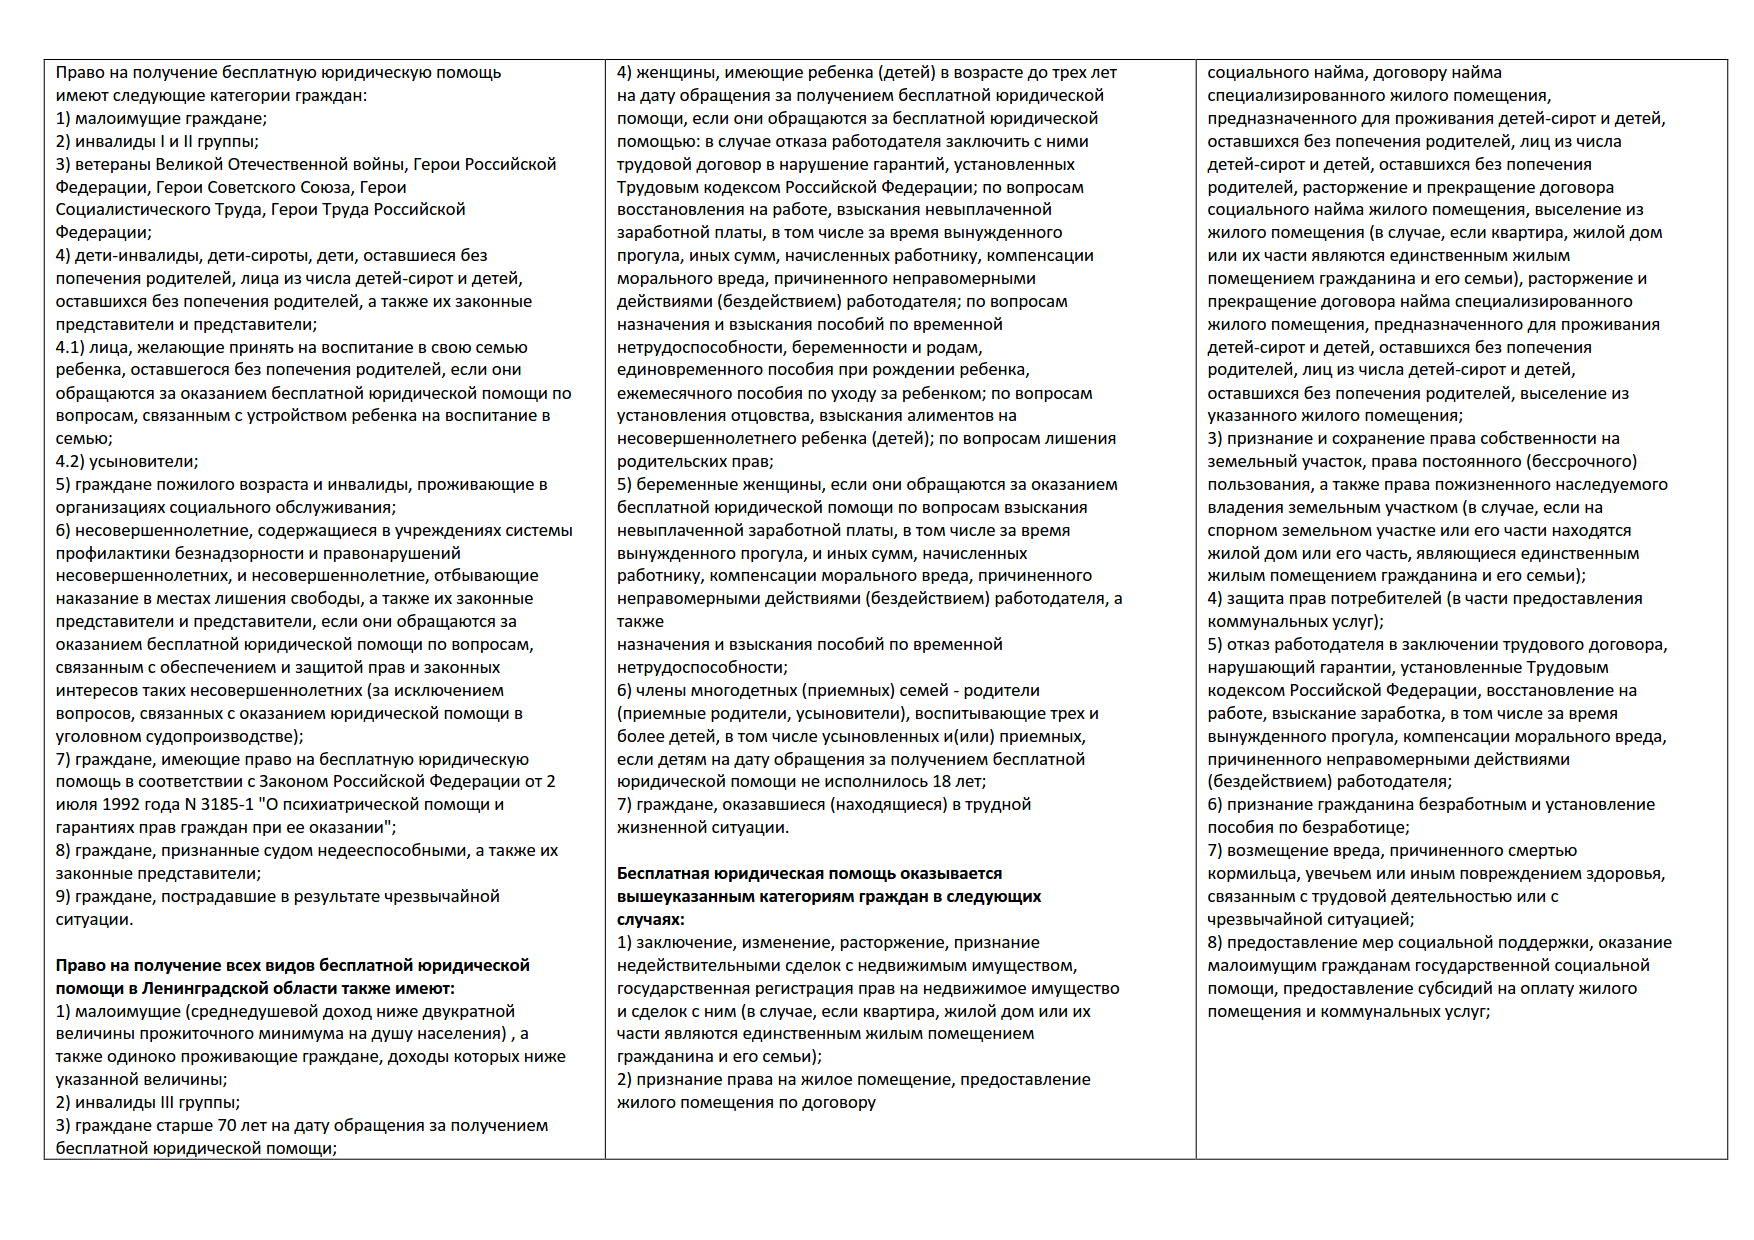 брошюра по БЮП_2